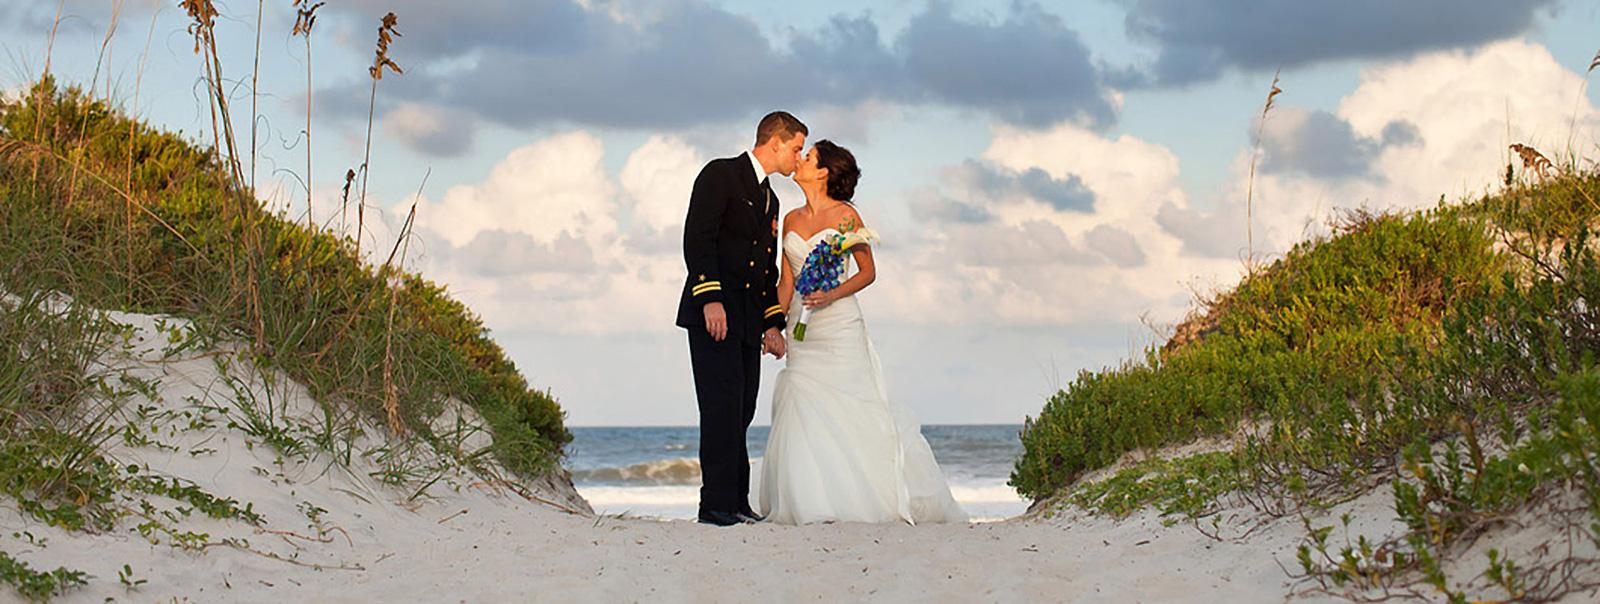 Anytime Wedding Chapel Amp Destination Weddings San Diego